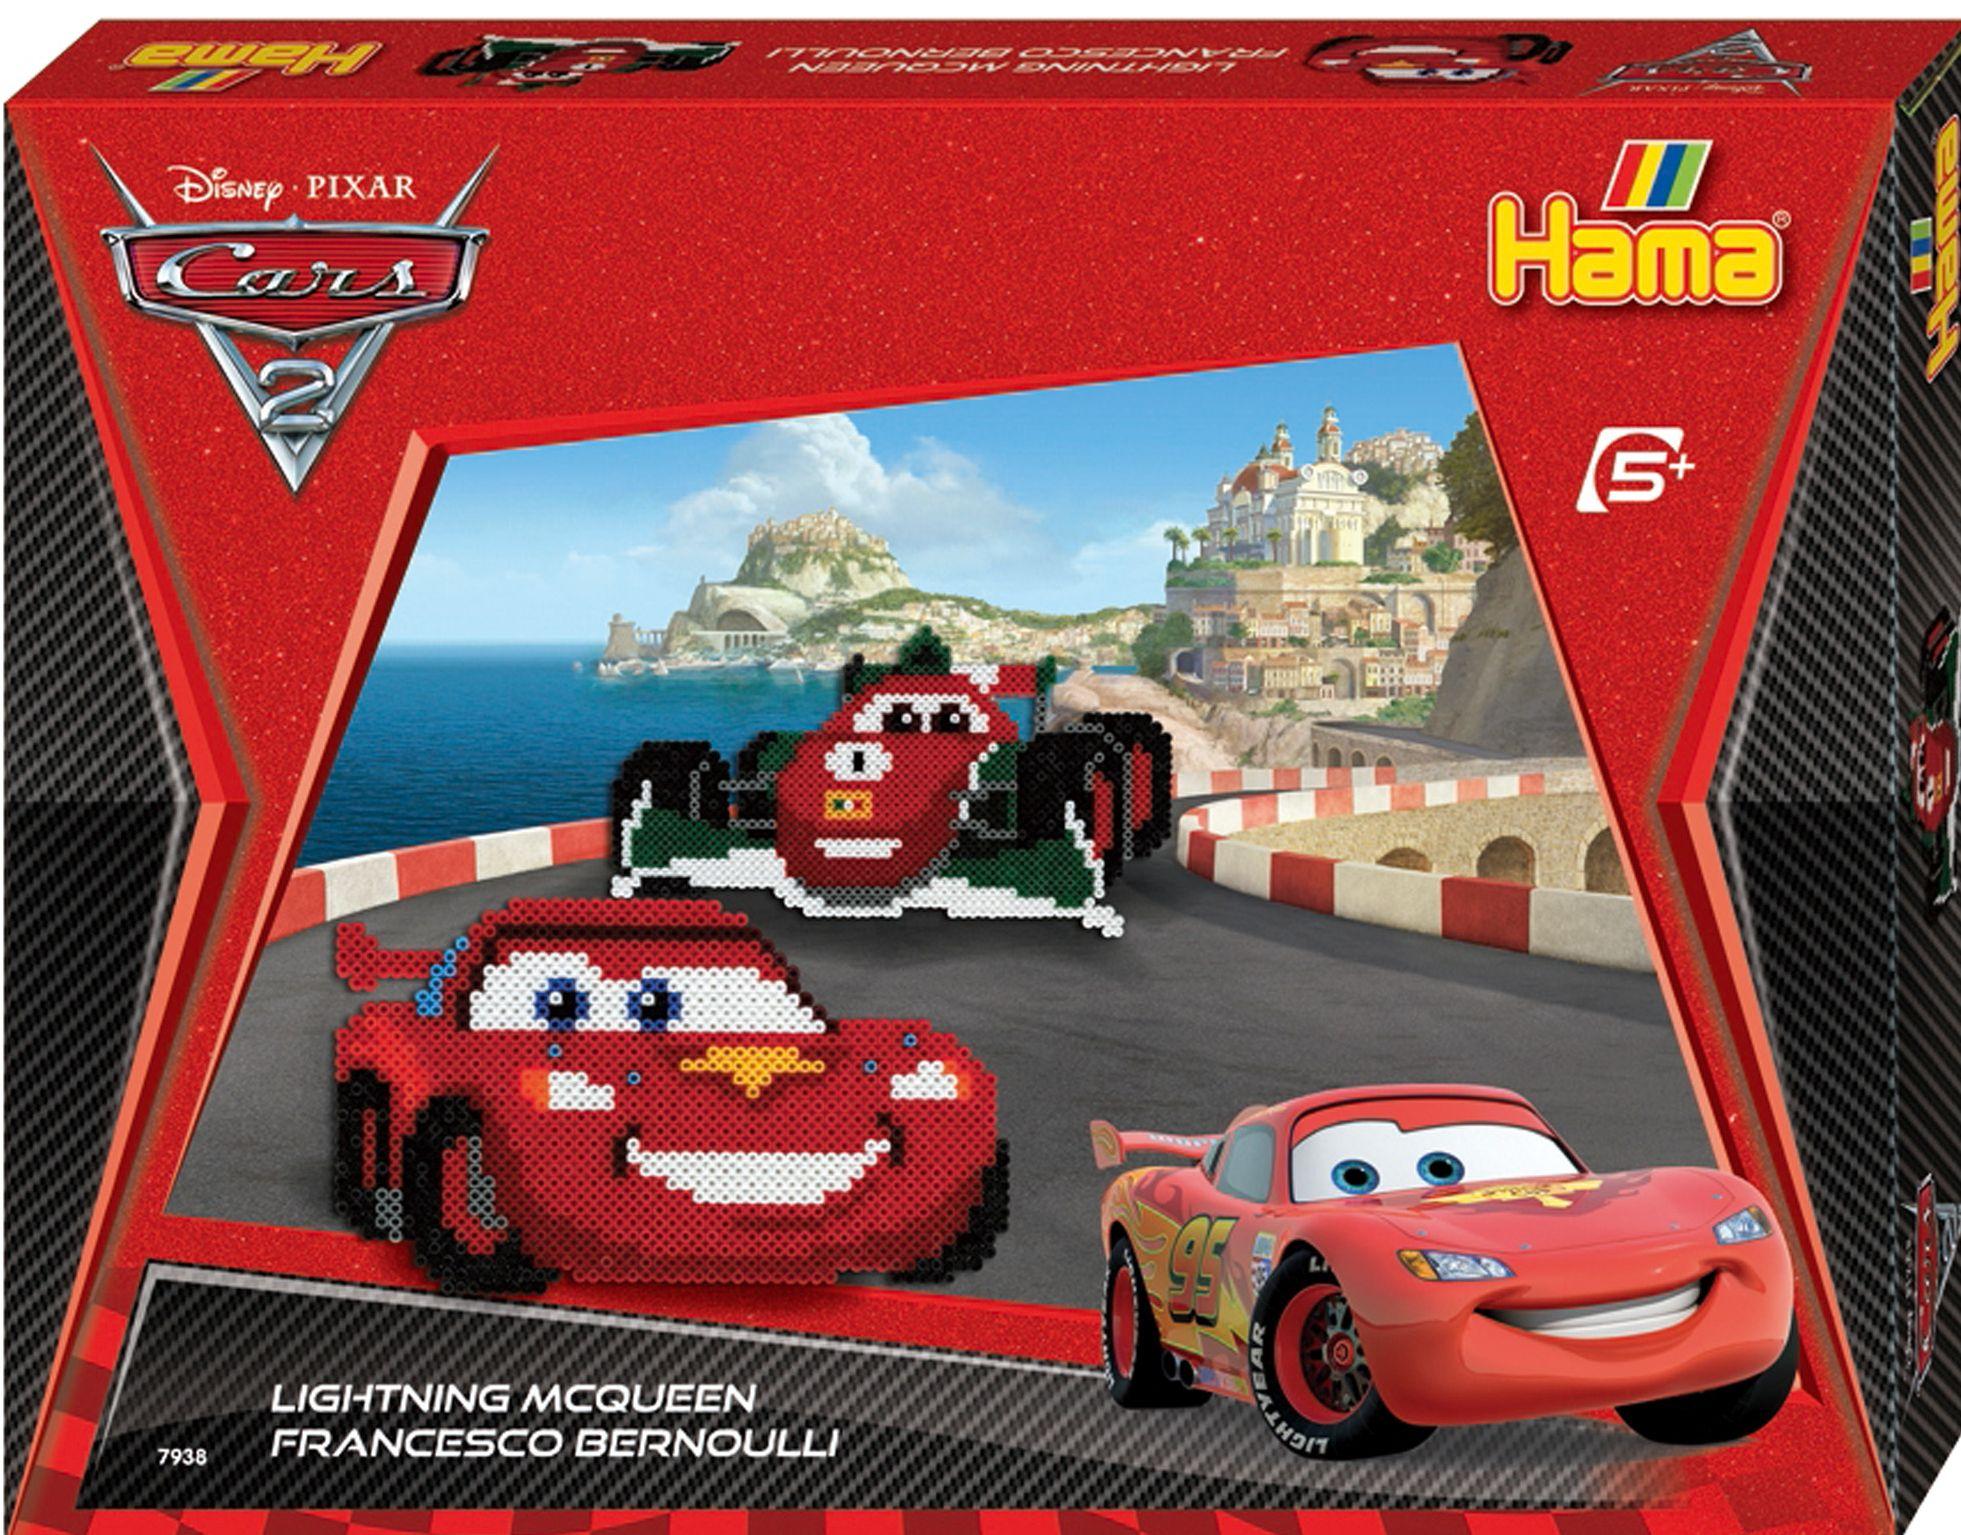 Cars Lightning Mcqueen Ultimate Race Set 9485 Disney 2 Box